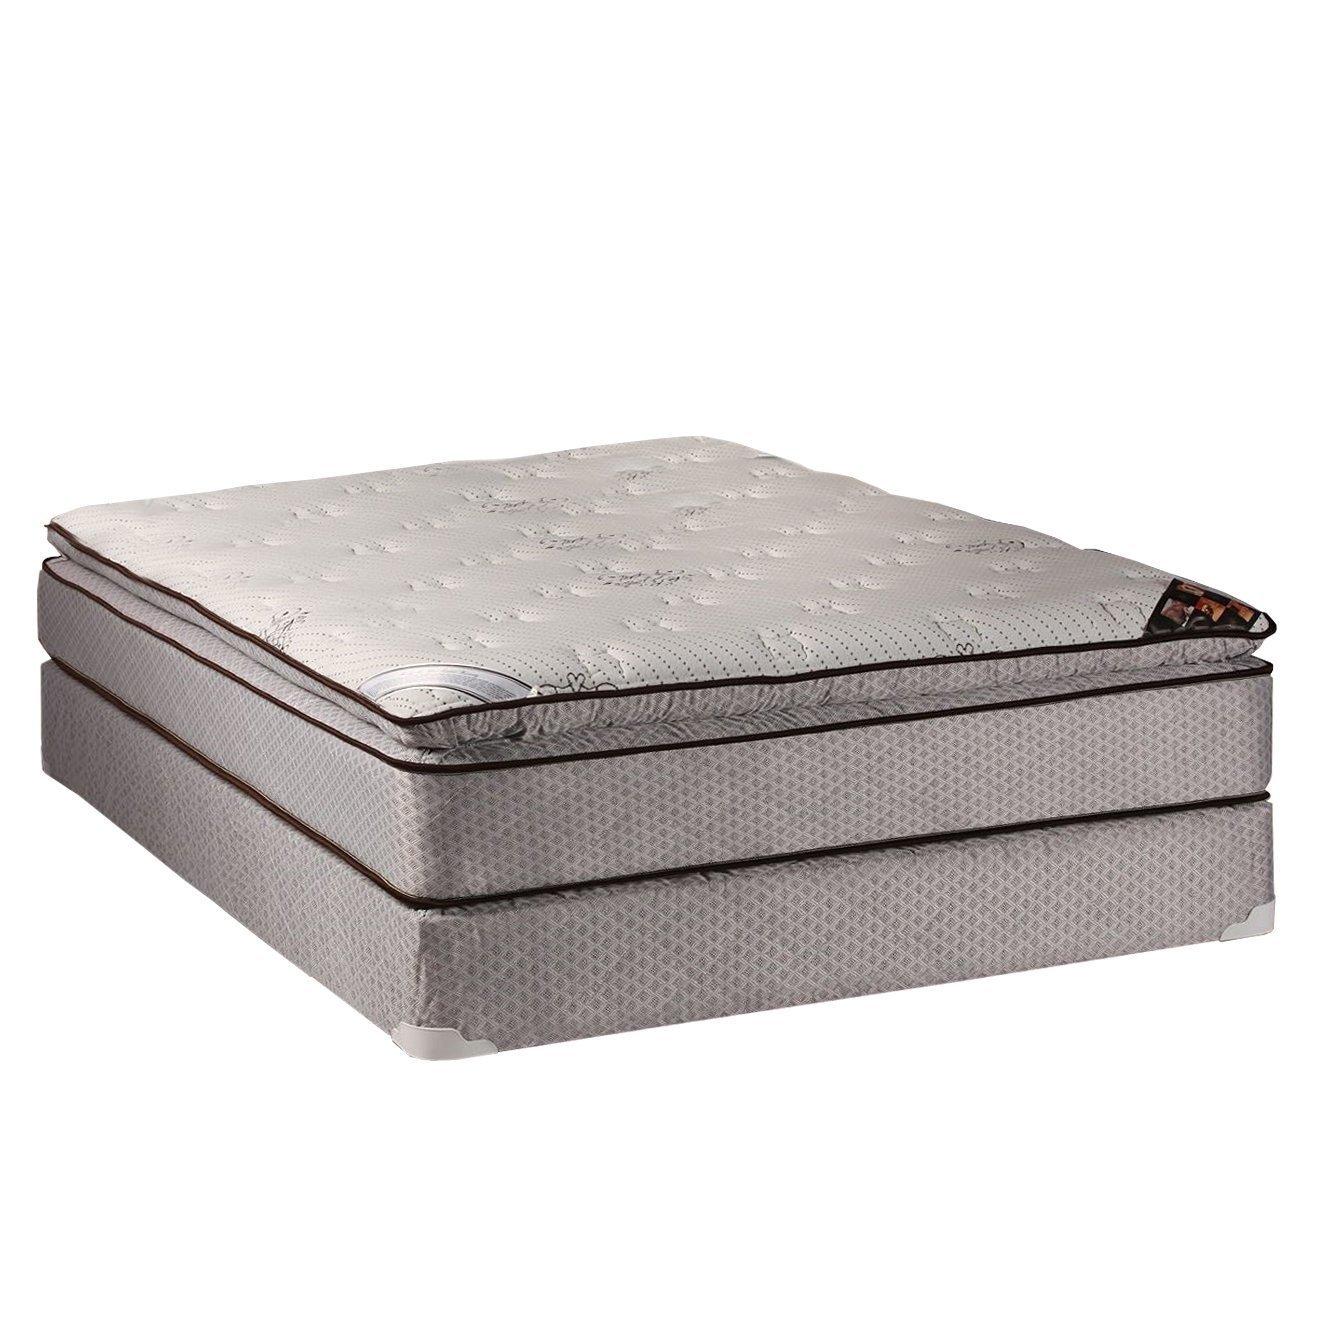 pillow top sofa bed mattress pad king single nz spinal dream soft plush ny